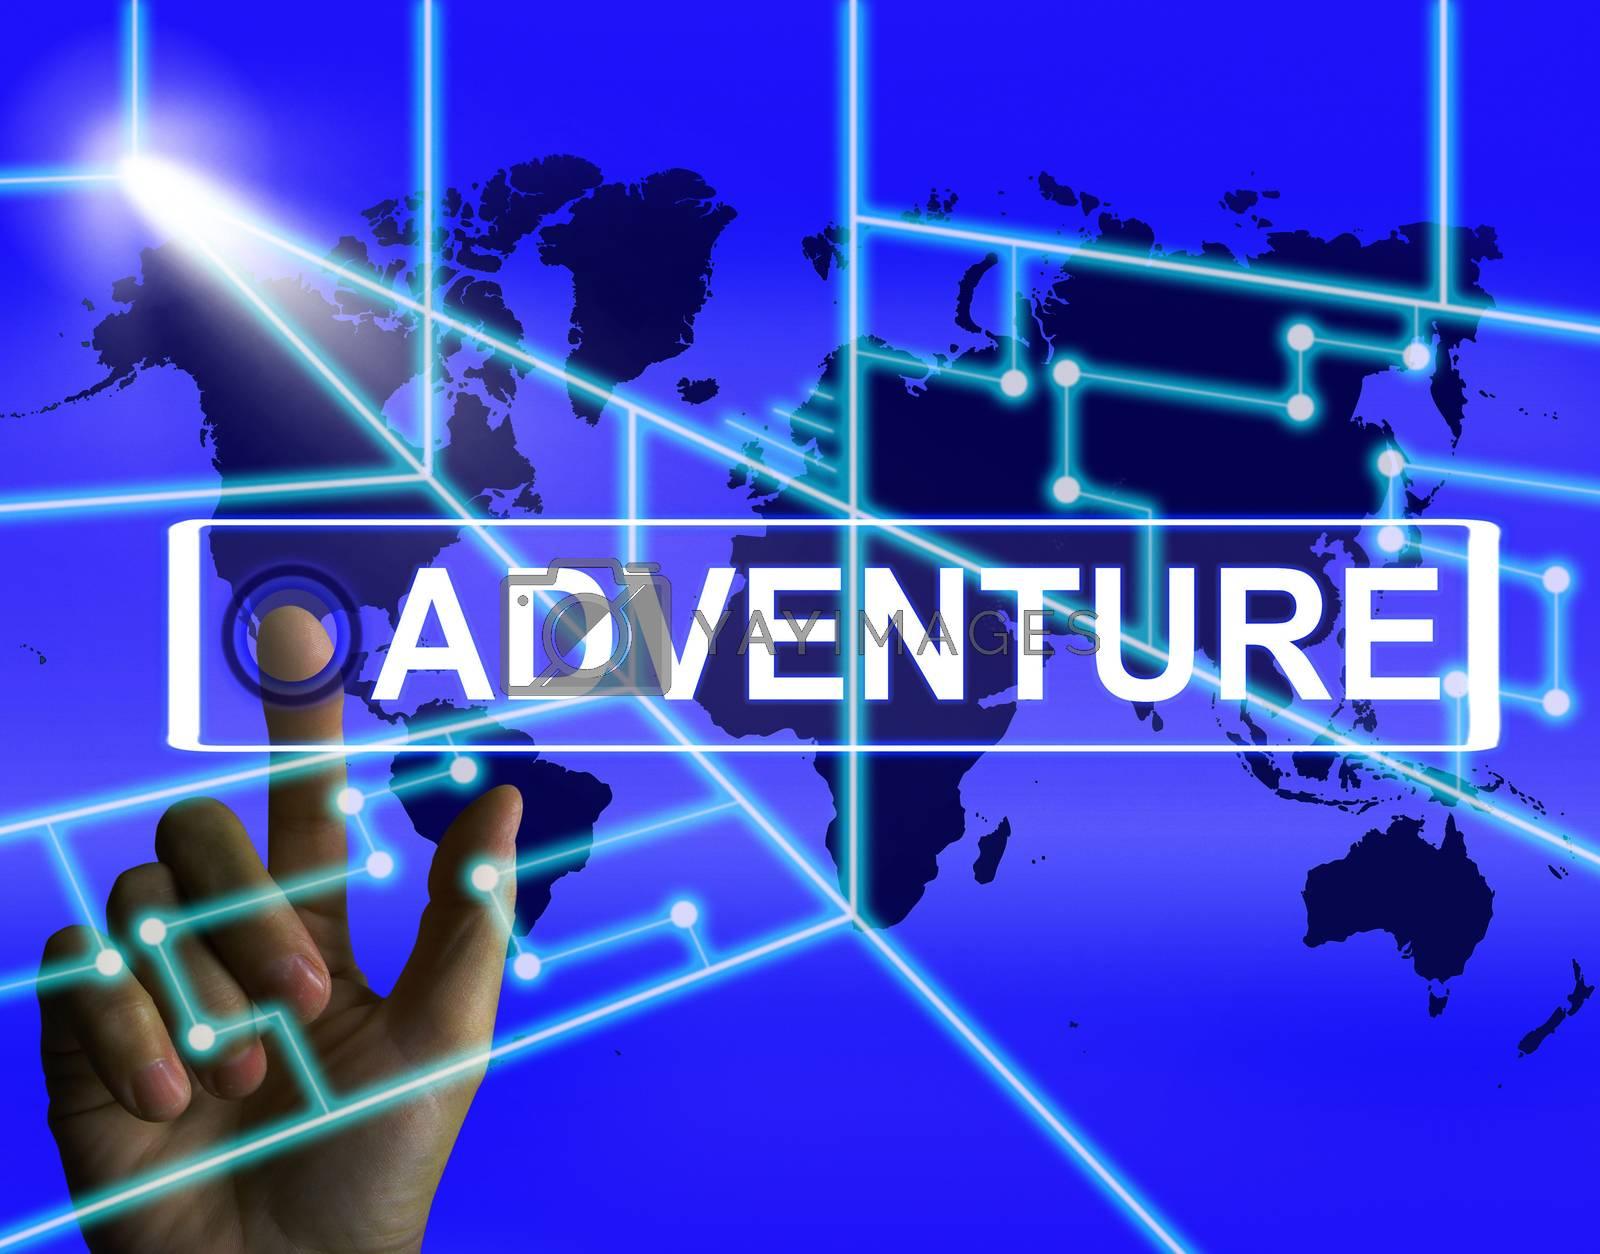 Adventure Screen Represents International or Internet Adventure  by stuartmiles